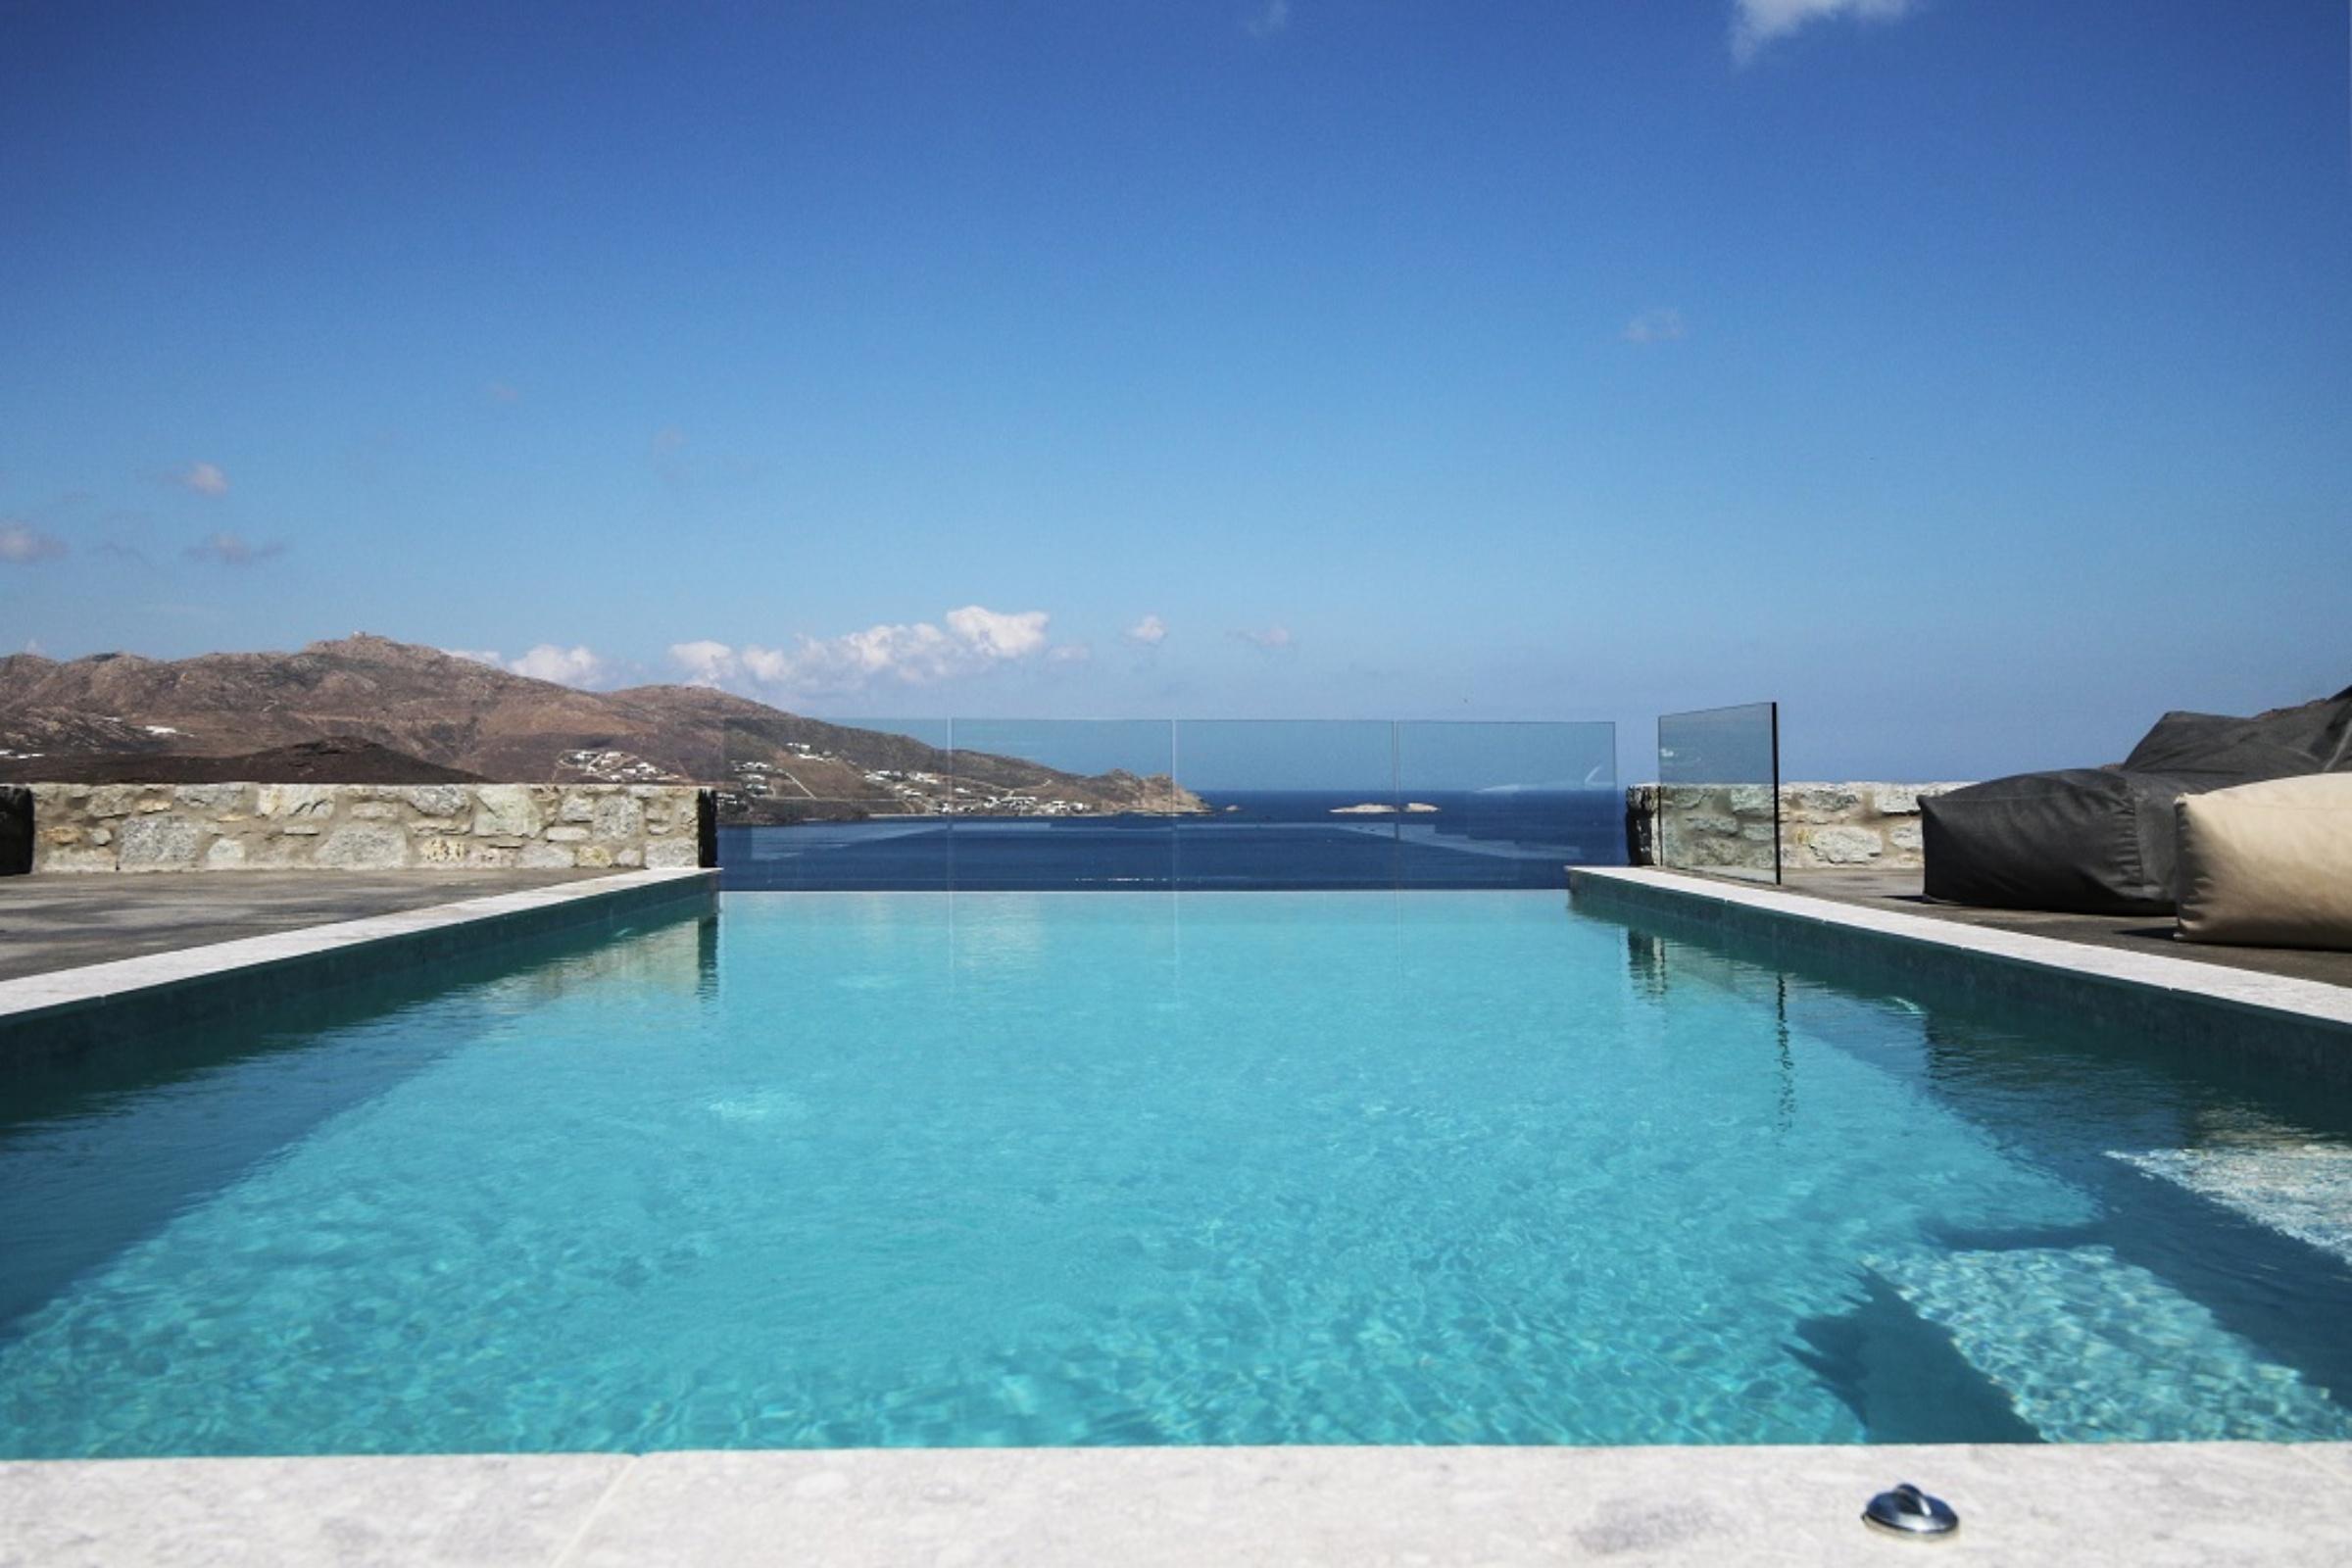 villa gian ftelia pool